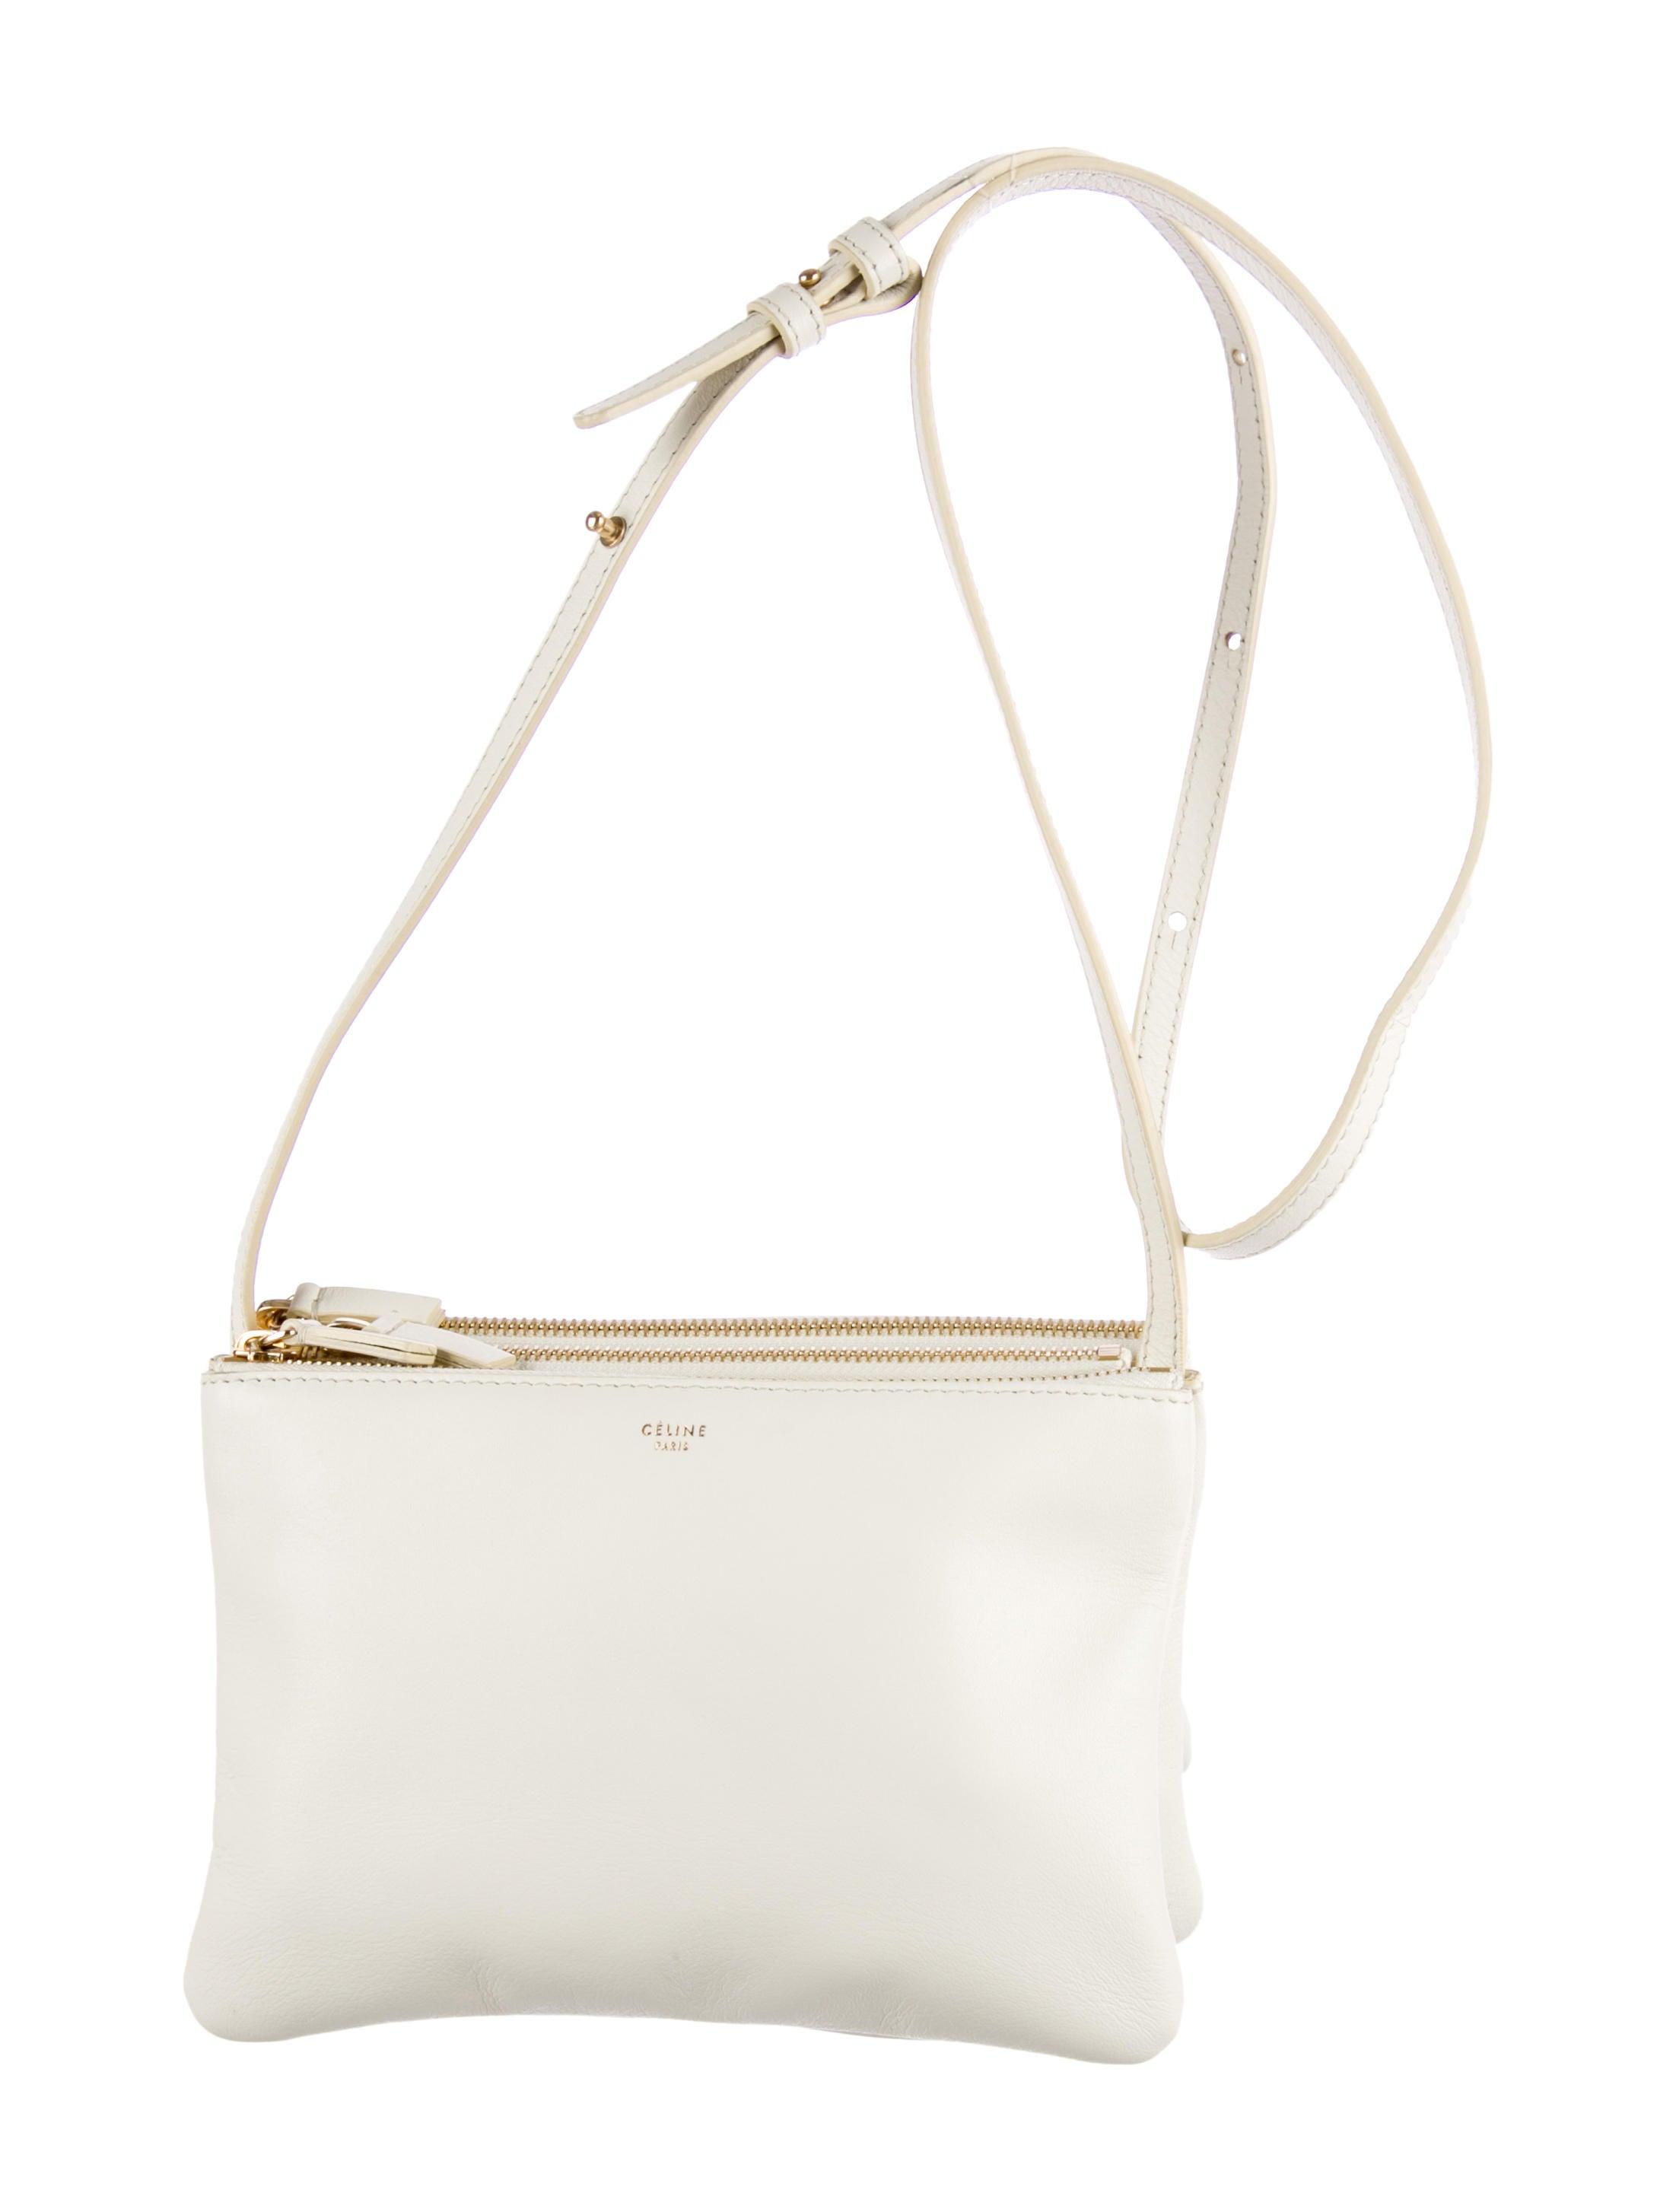 C¨¦line Small Trio Crossbody Bag - Handbags - CEL27616 | The RealReal